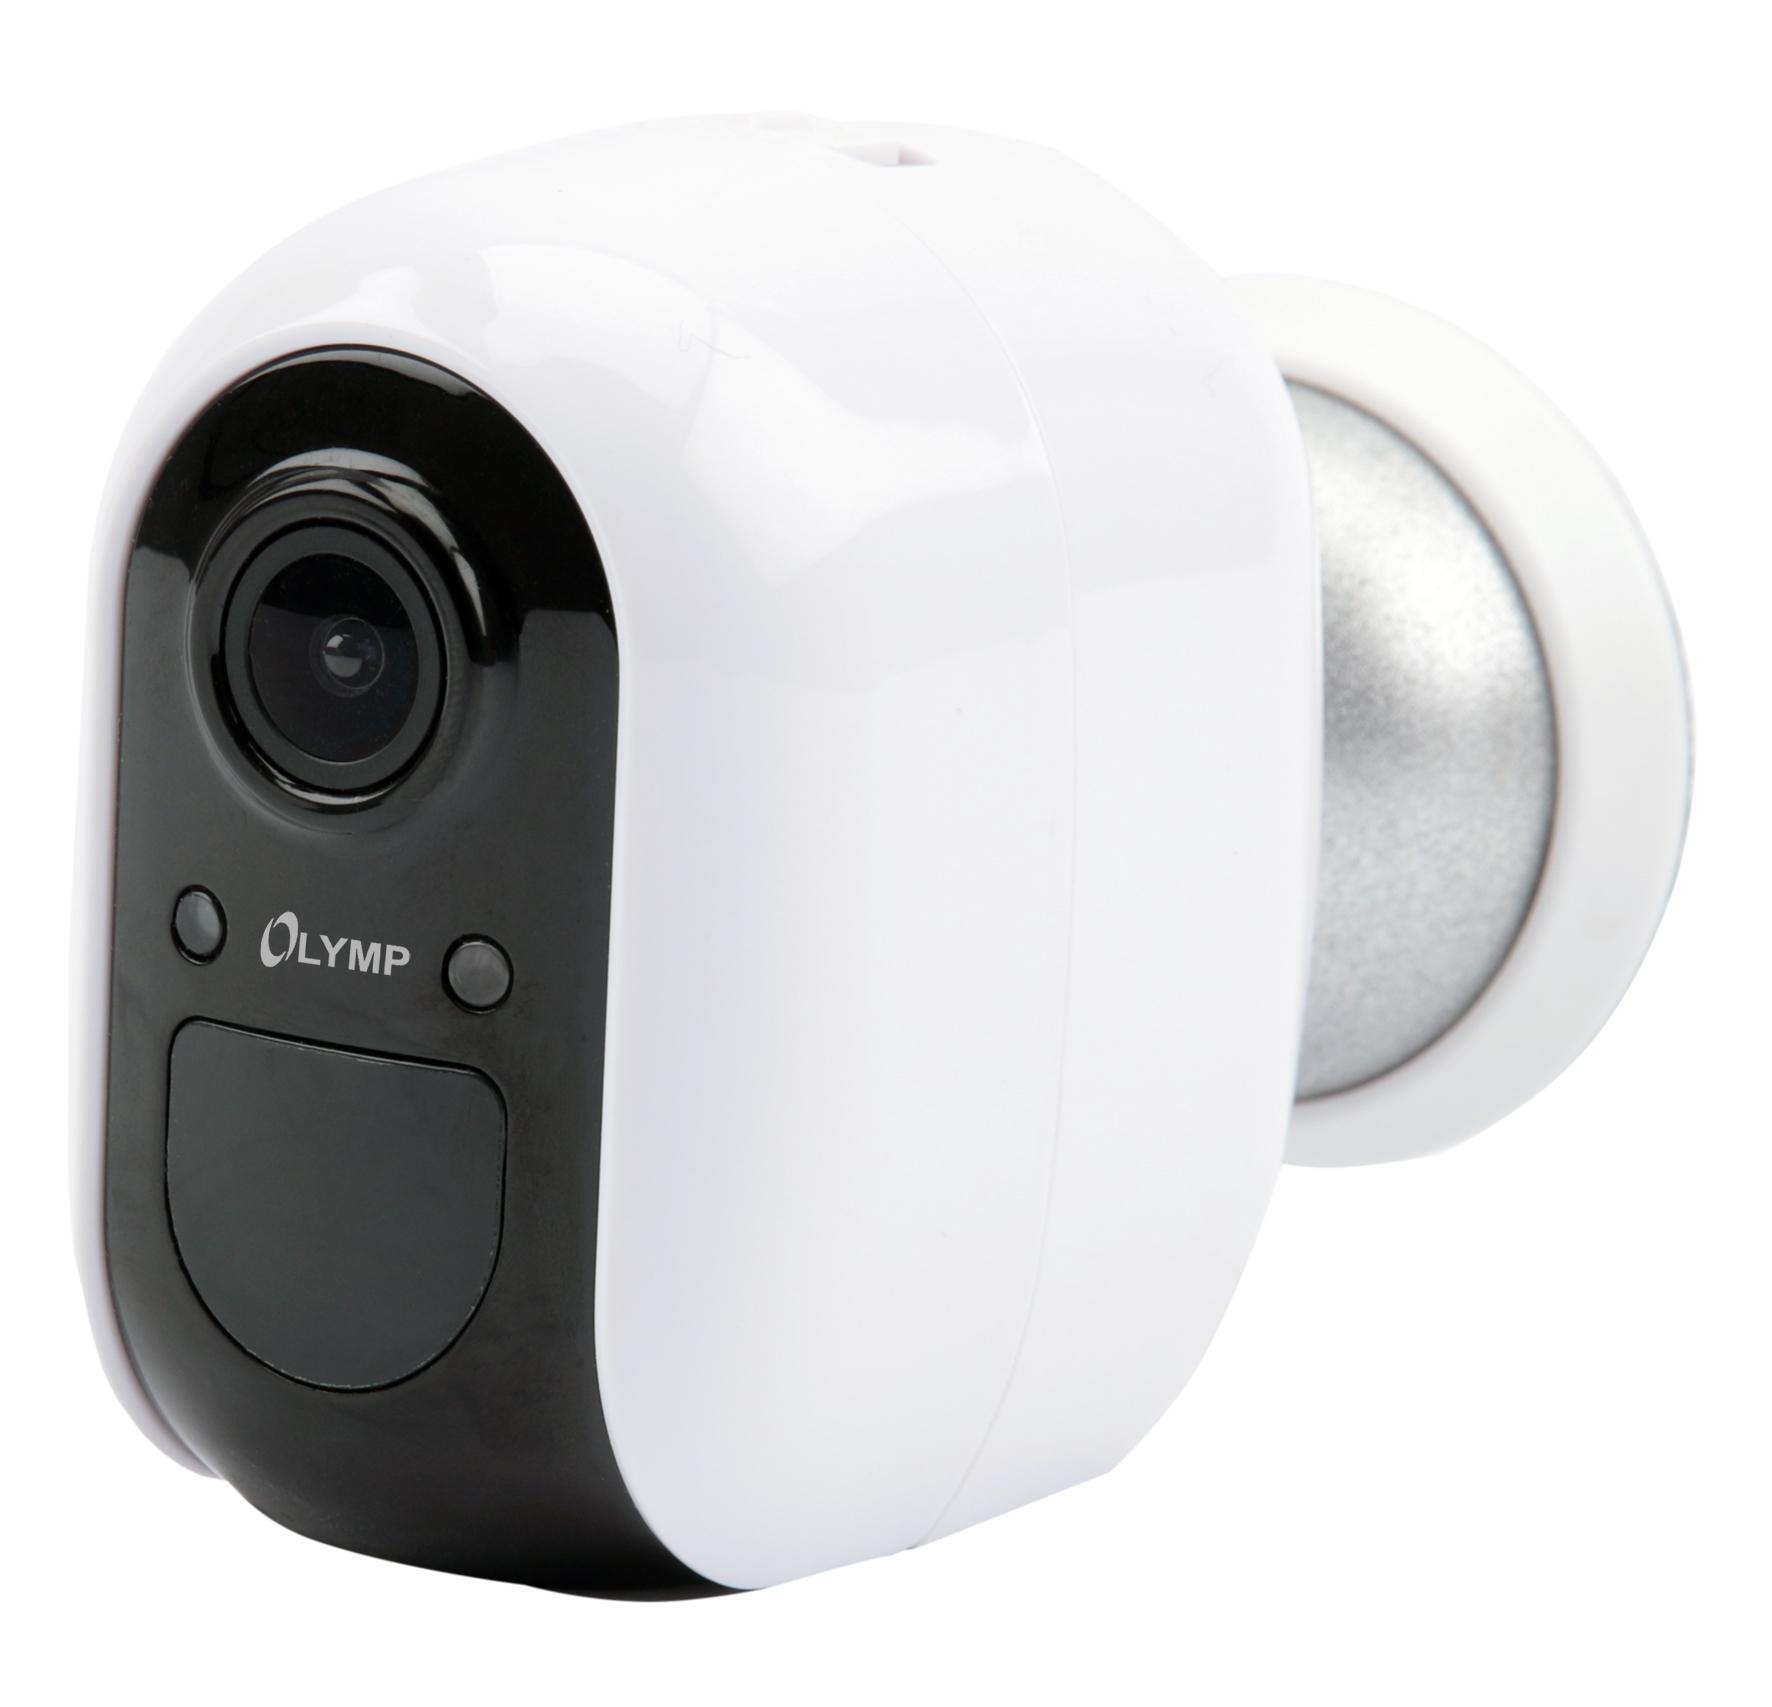 Olympia OC 1000 - IP-Sicherheitskamera - Innen & Außen - Kabellos - 80 m - Amazon Alexa & Google Assistant - 2400 MHz